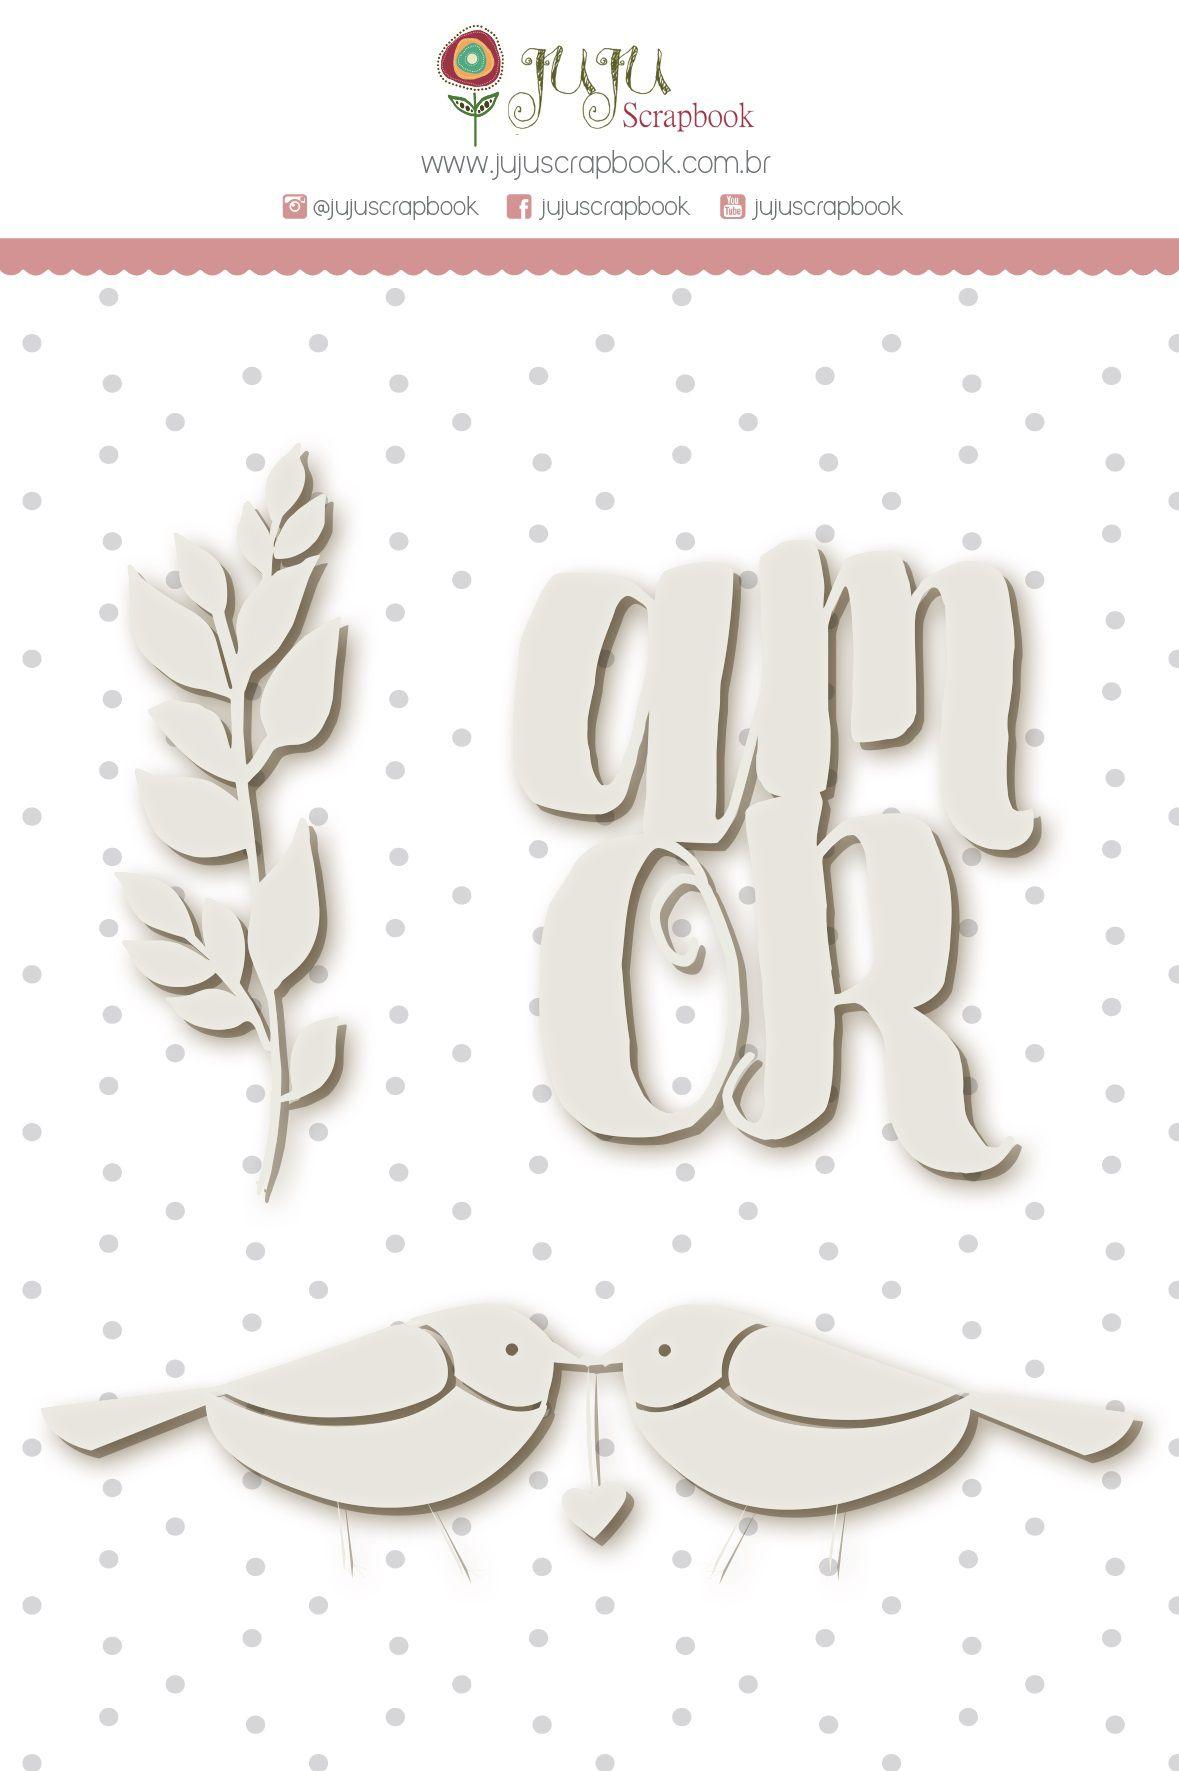 Enfeite Chipboard Branco Amor - Coleção Felizes Para Sempre - JuJu Scrapbook  - JuJu Scrapbook